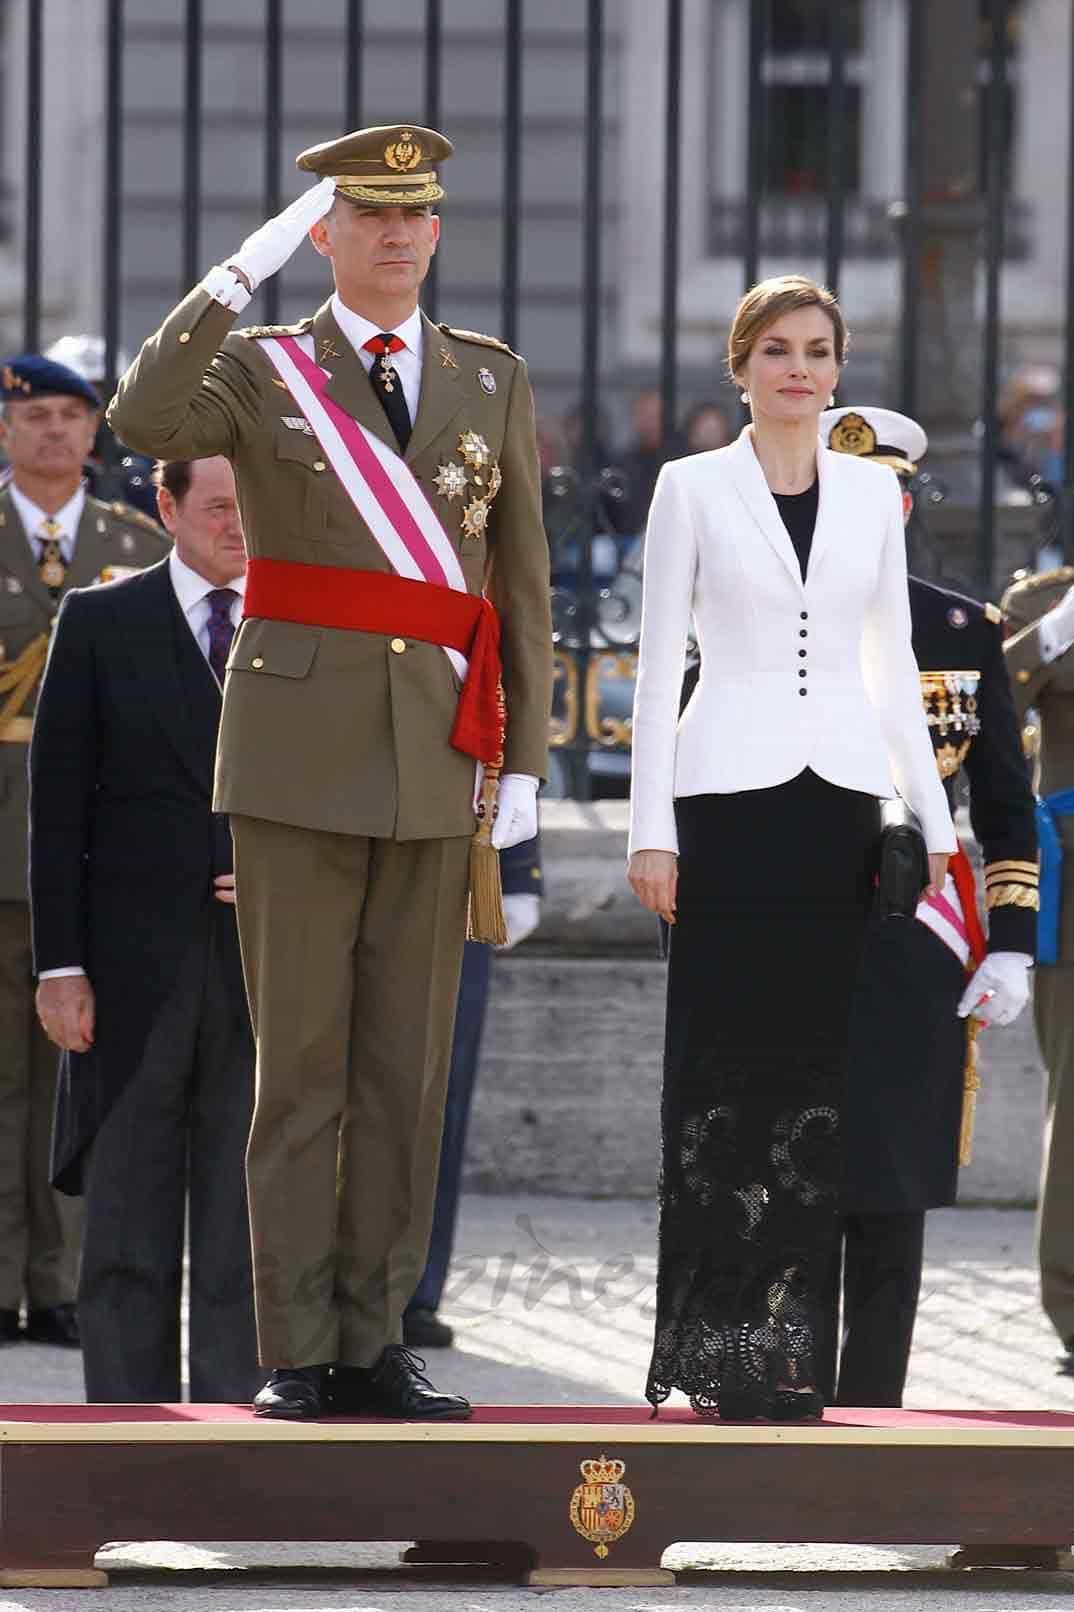 reyes-de-espana-en-la-pascua-militar-